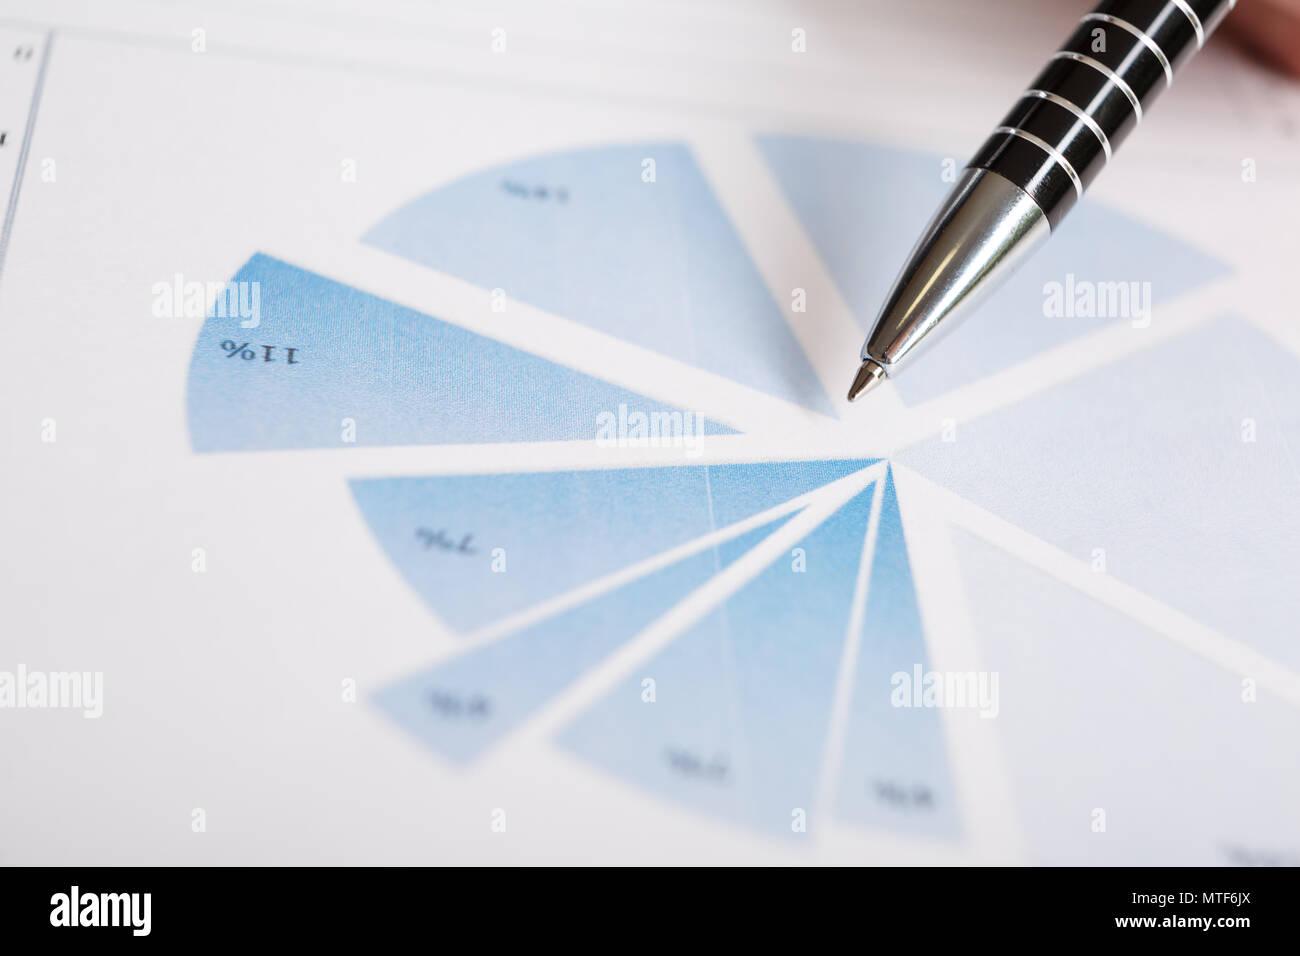 Pen auf die Grafik. Makro Bild. Finanzielle Daten analyse Konzept Stockbild